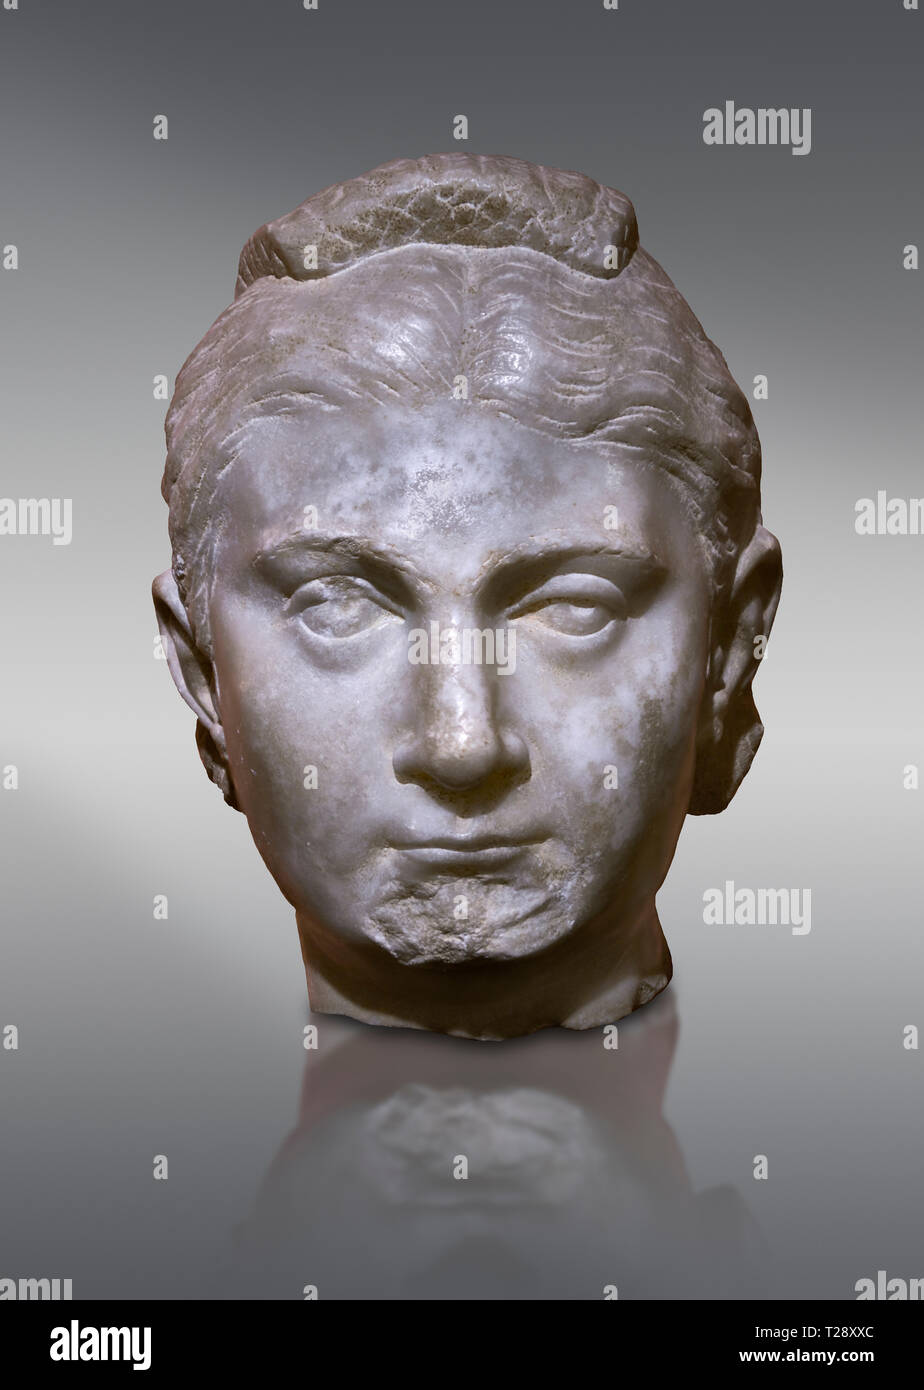 MAN STATUE HEAD ORNAMENT STONE GARDEN ROMAN CENTURION BUST